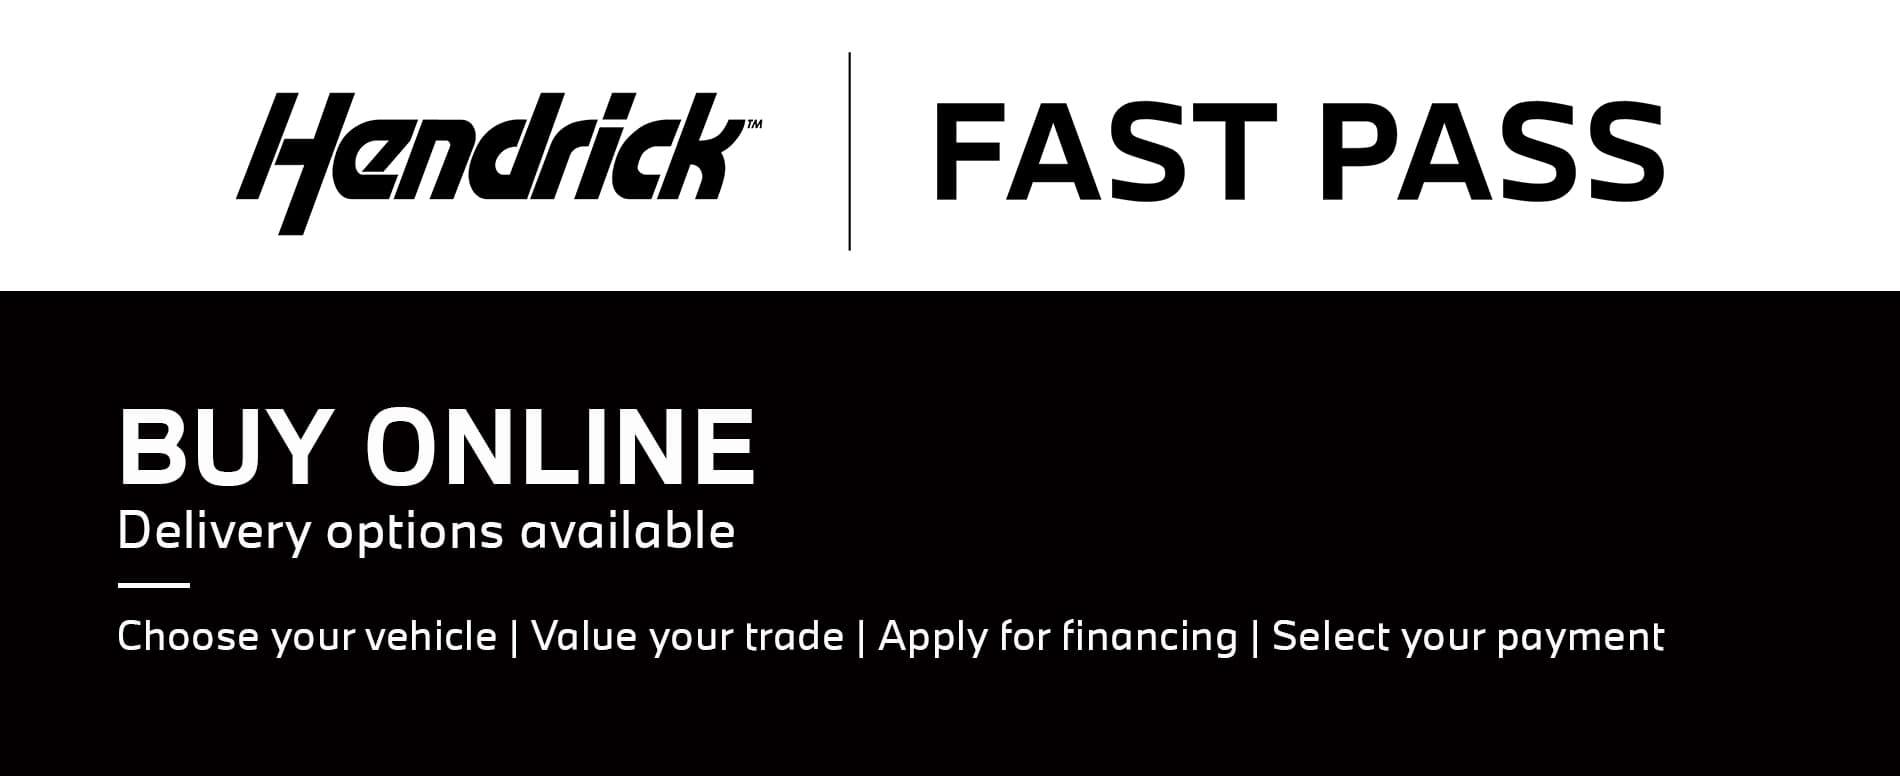 Hendrick FastPass